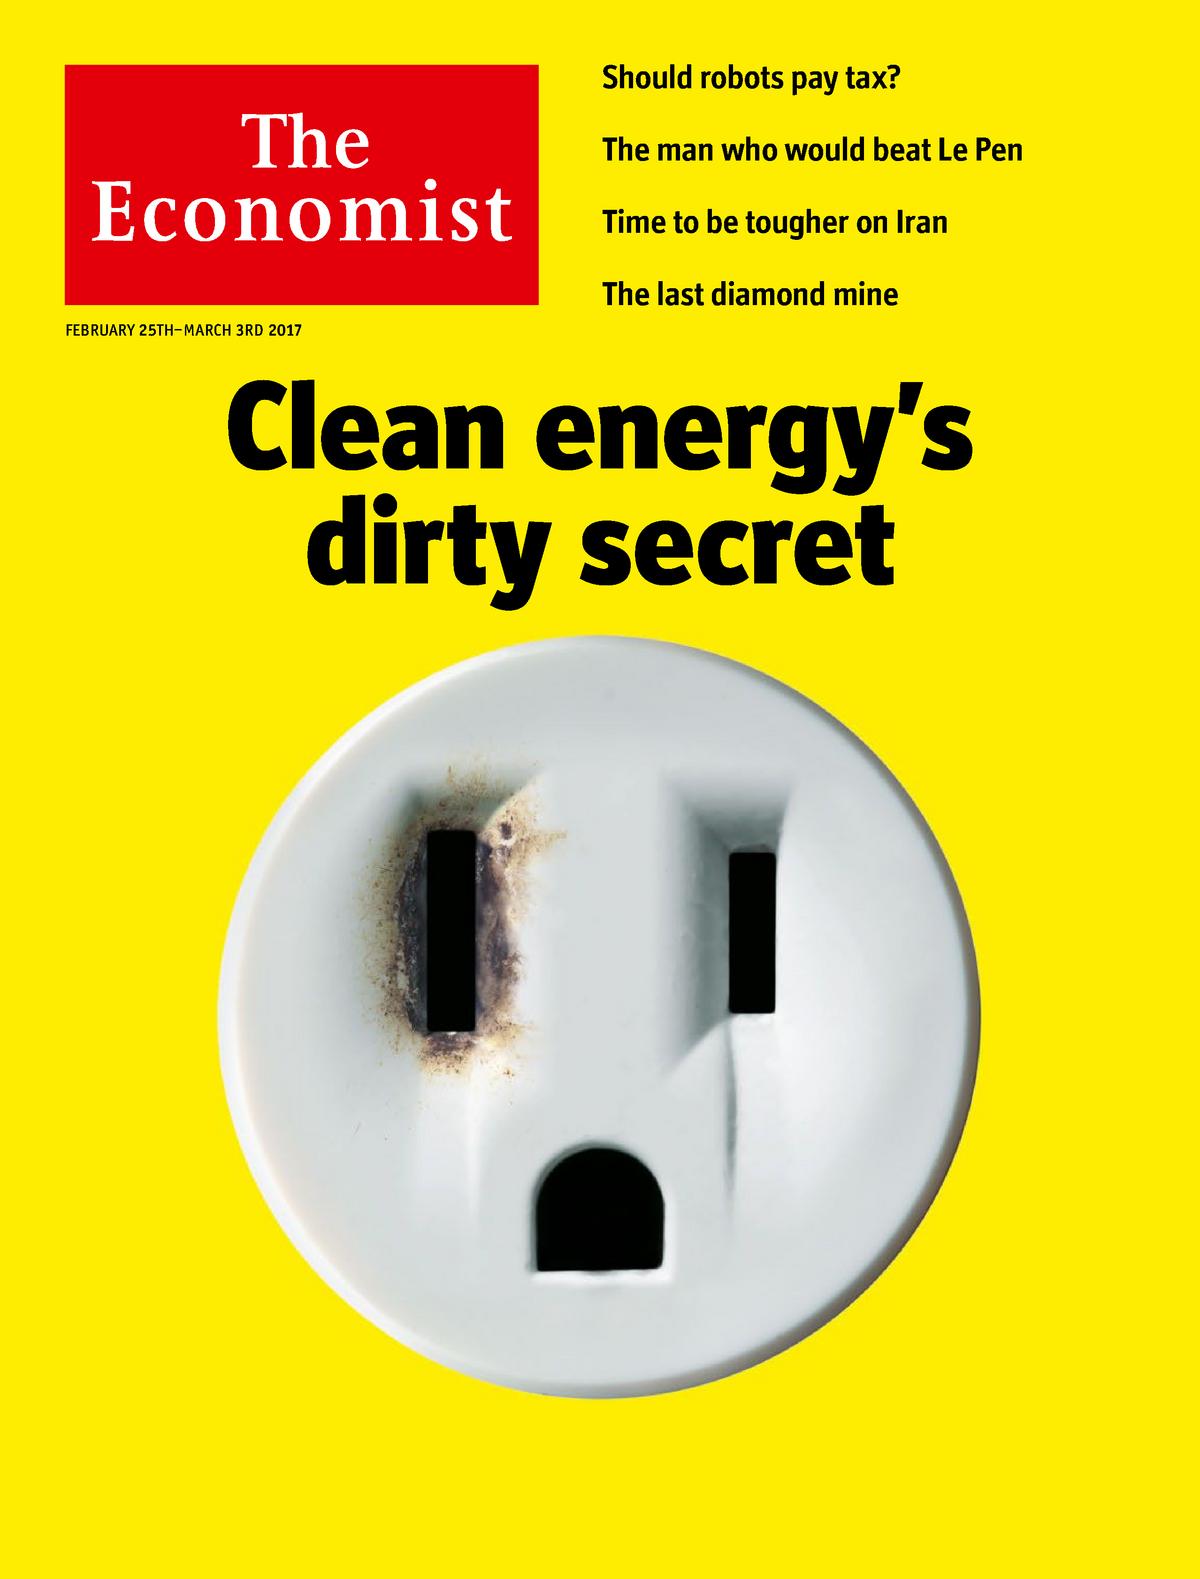 The Best Economic Magazine - 1089: Management - StuDocu